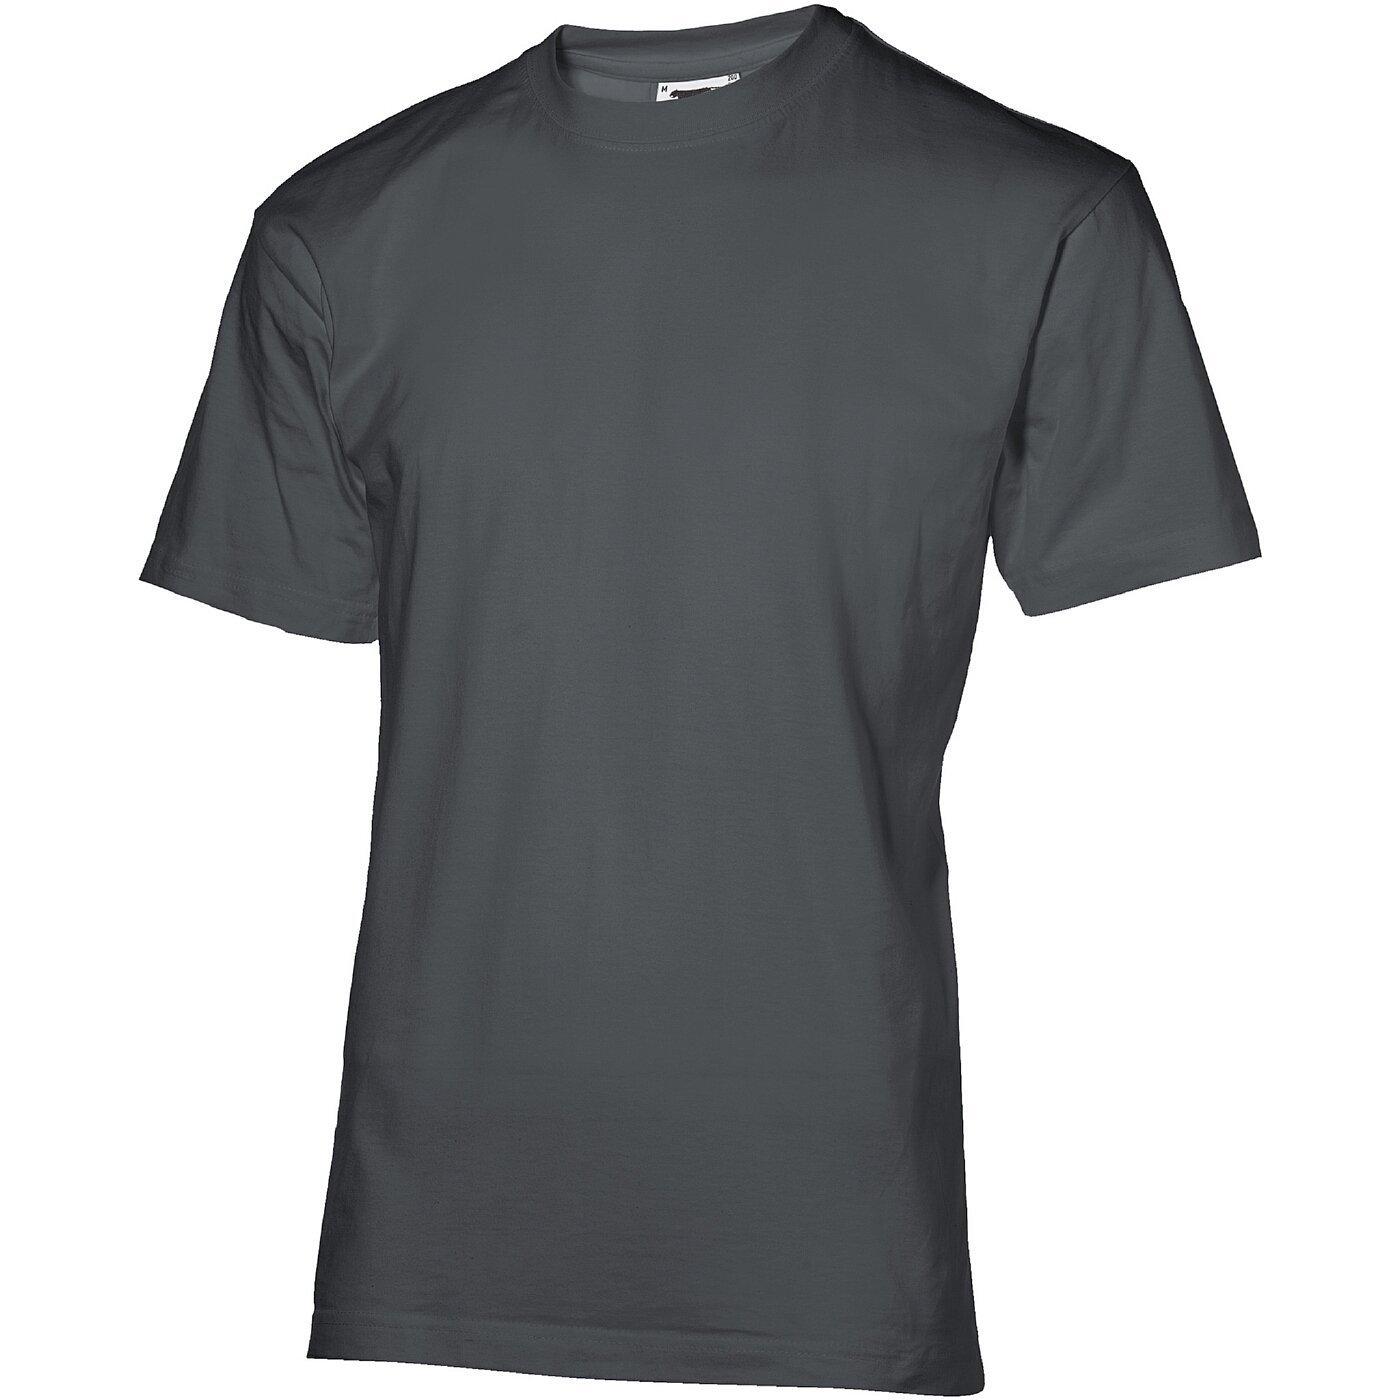 Slazenger 10er Pack T-Shirt 200 TShirt 100% Baumwolle S - - - XXXL B00OXVEQJS T-Shirts Qualität 8bbd93